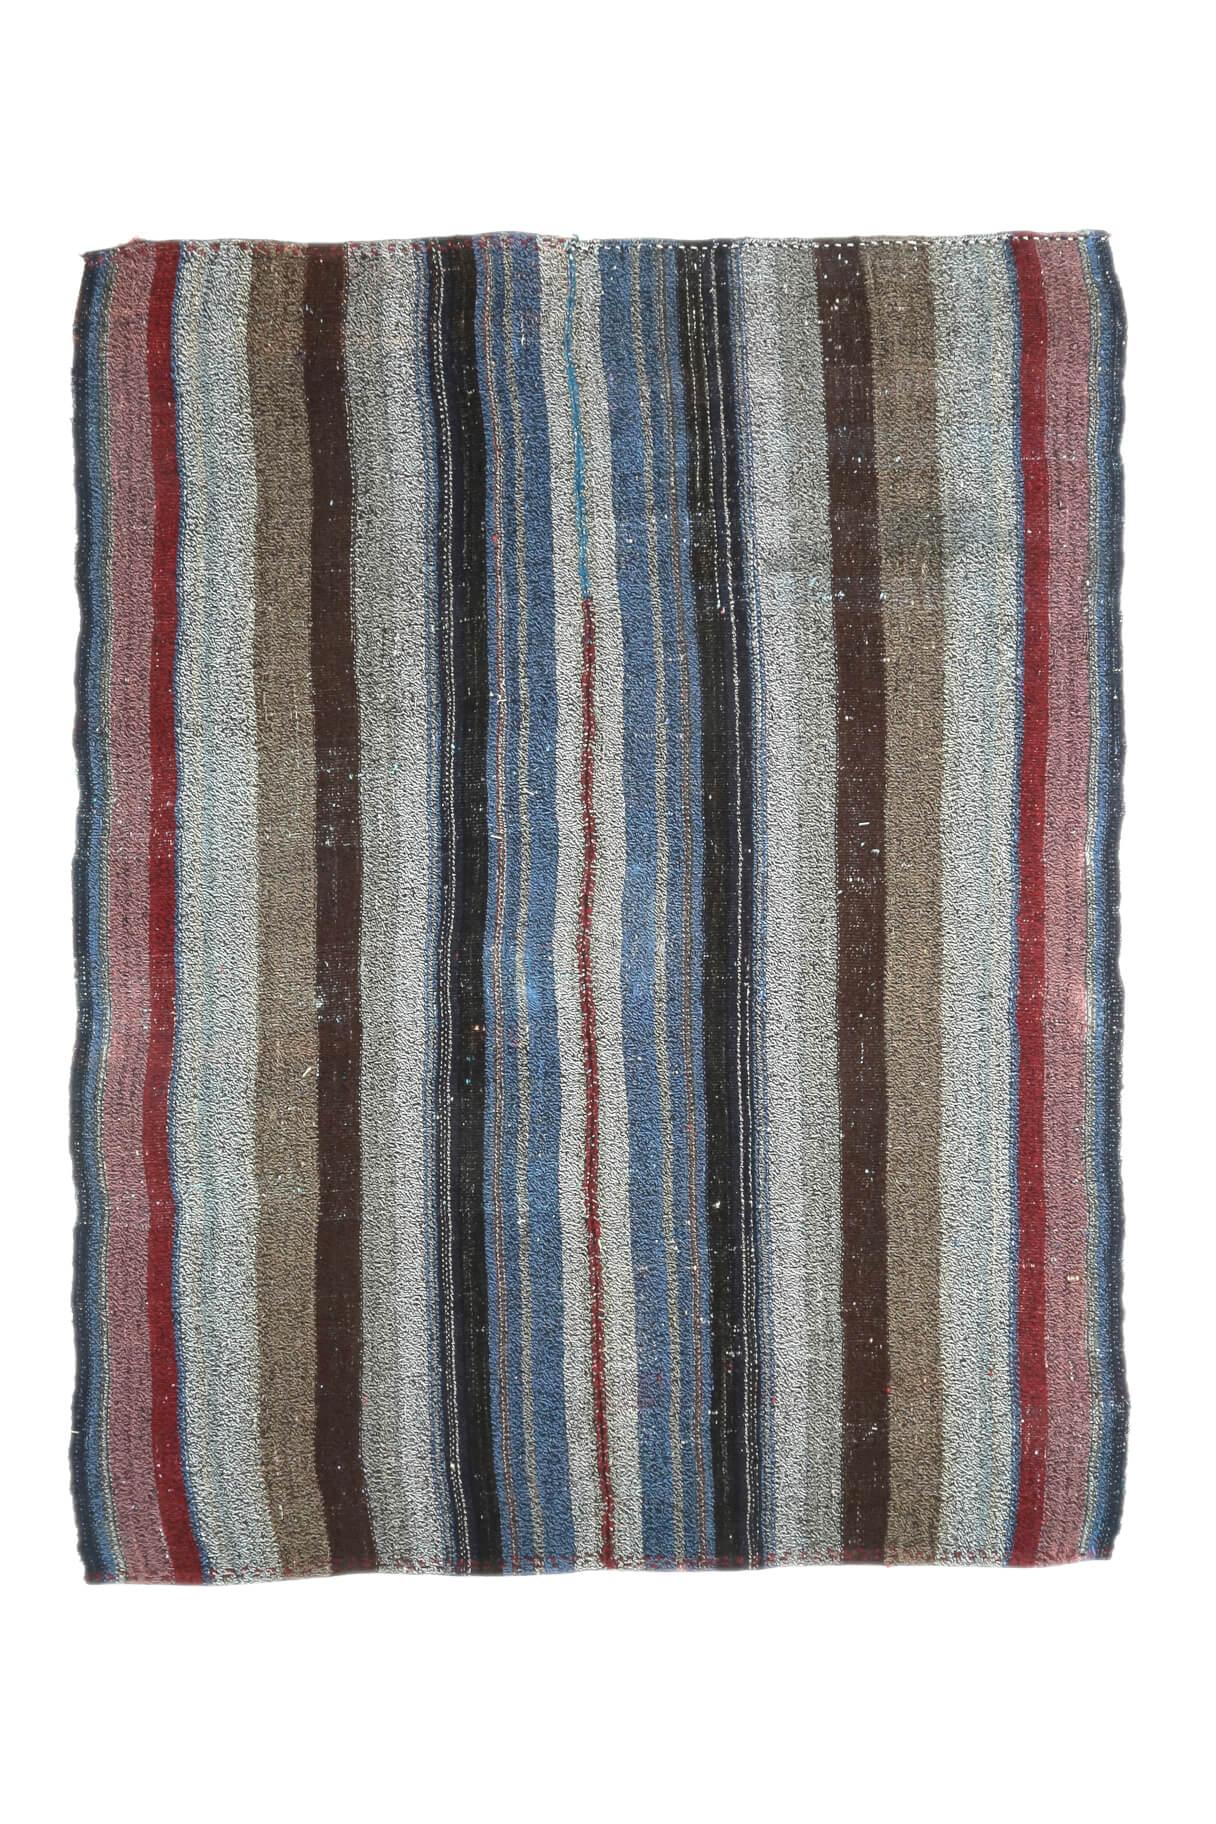 Hande - Colorful Ethnic Kilim